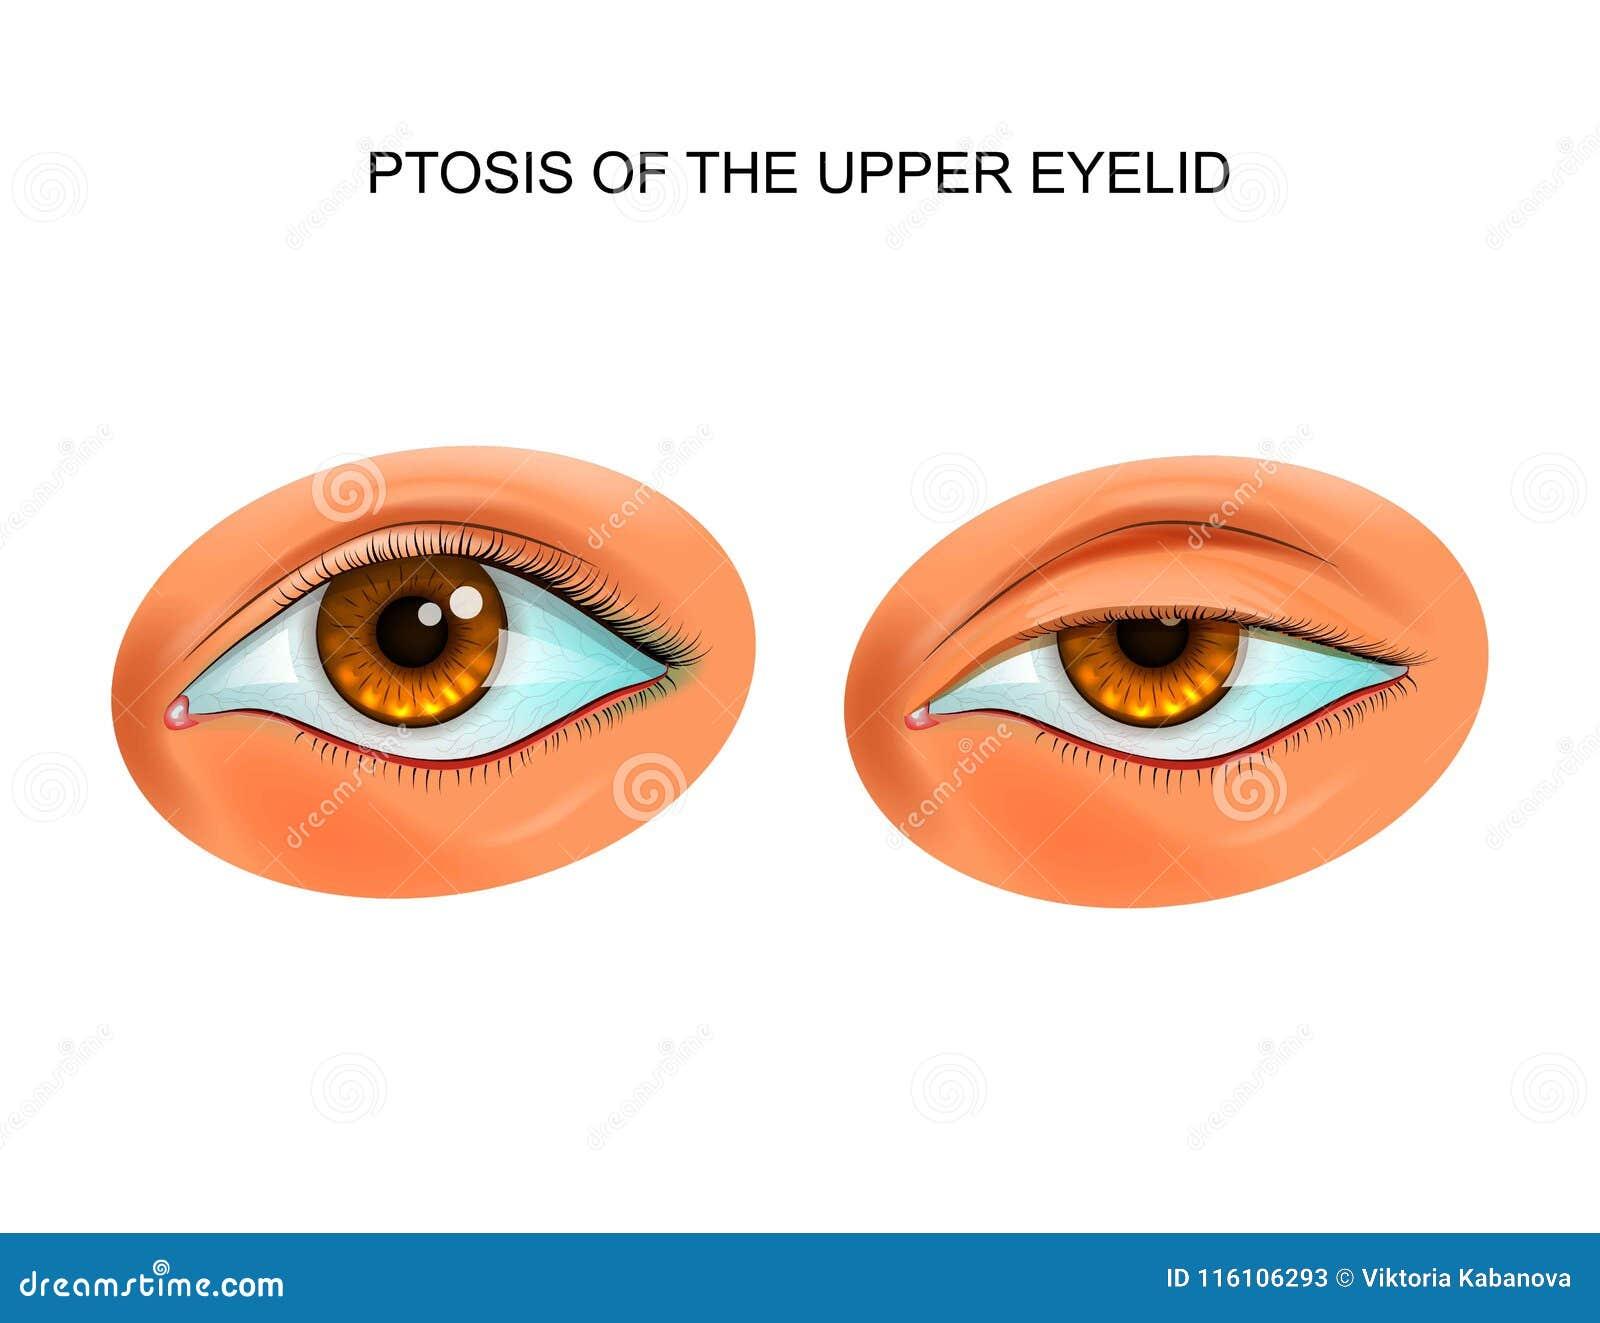 Ptosis of the eyelid